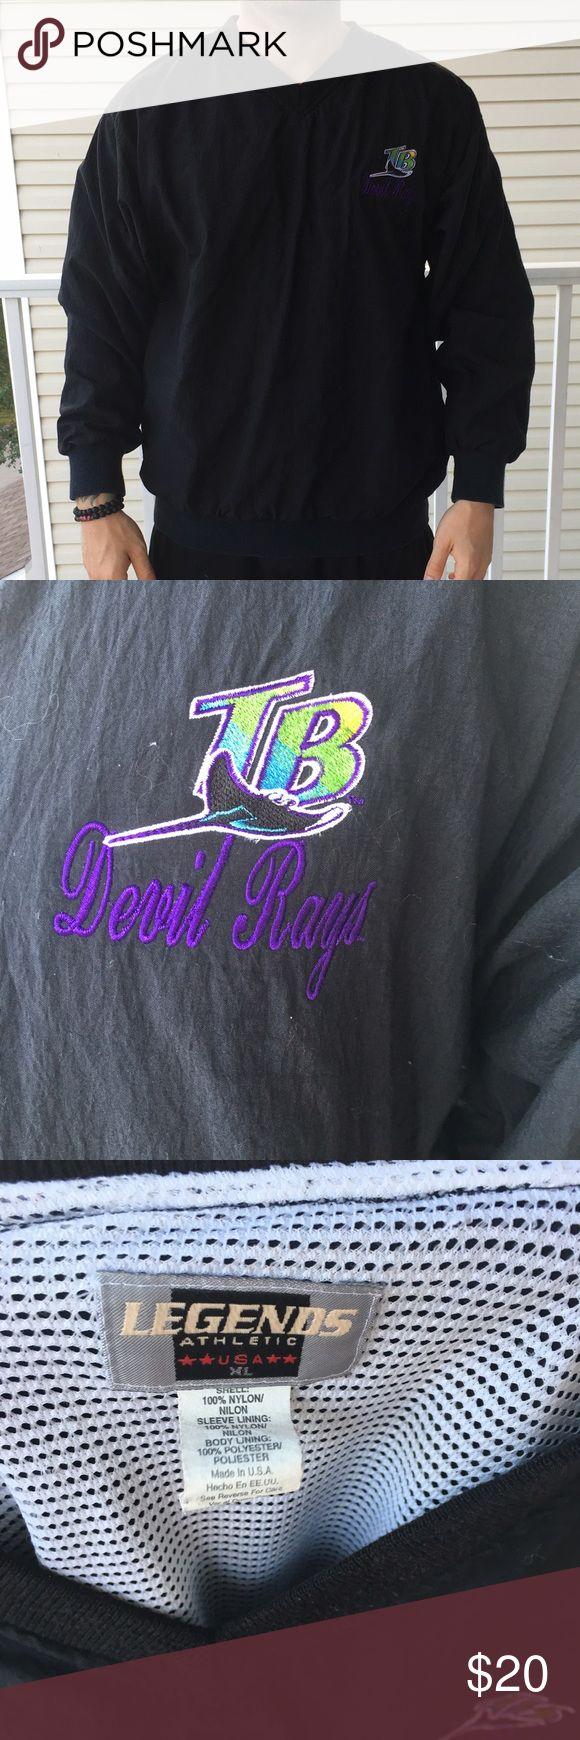 Shirt design tampa - Vintage Legends Athletics Tampa Bay Rays Jacket Fire Tampa Bay Devil Rays Pull Over Jacket